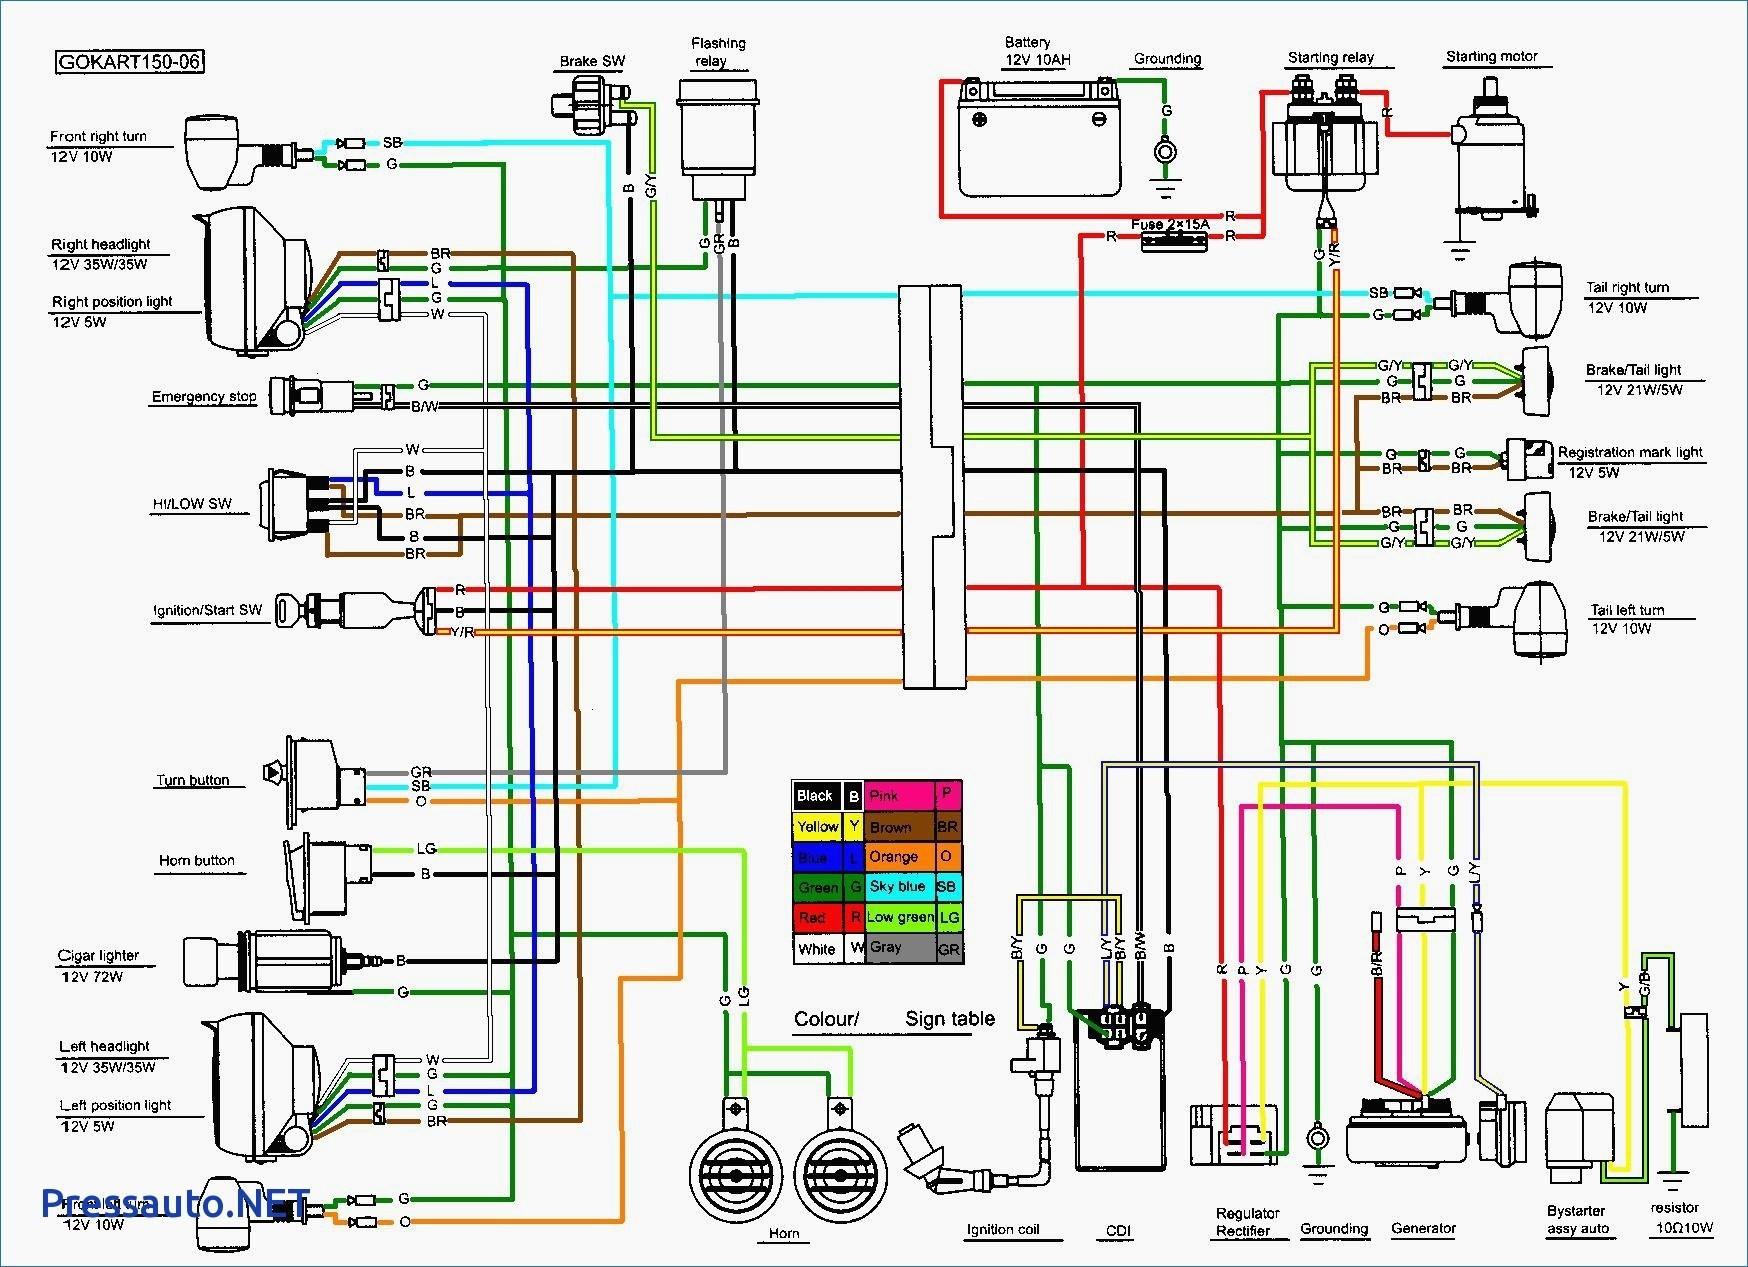 Scooter Engine Diagram Roketa 150 Engine Diagram Wiring Diagram • Of Scooter Engine Diagram